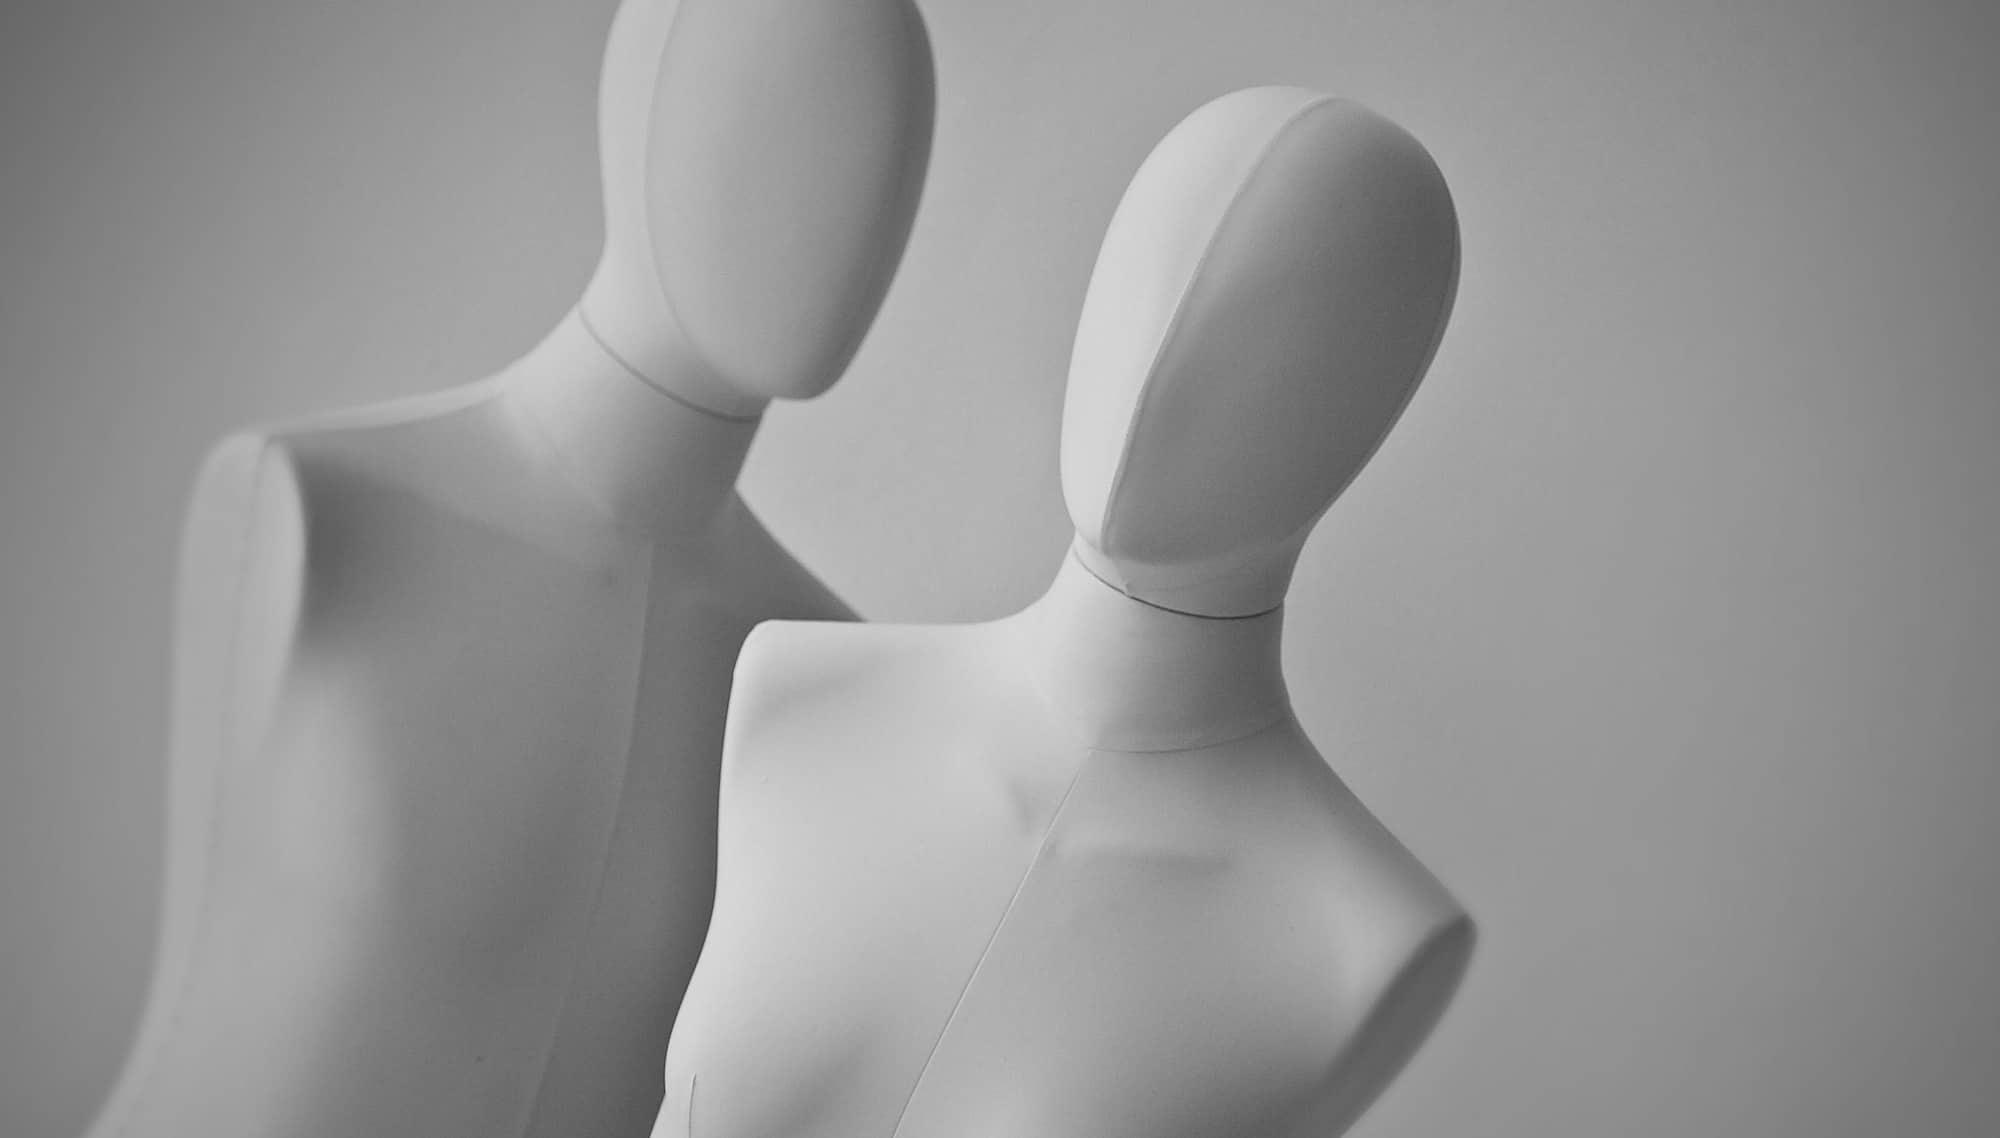 bonaveri-bust-forms-03